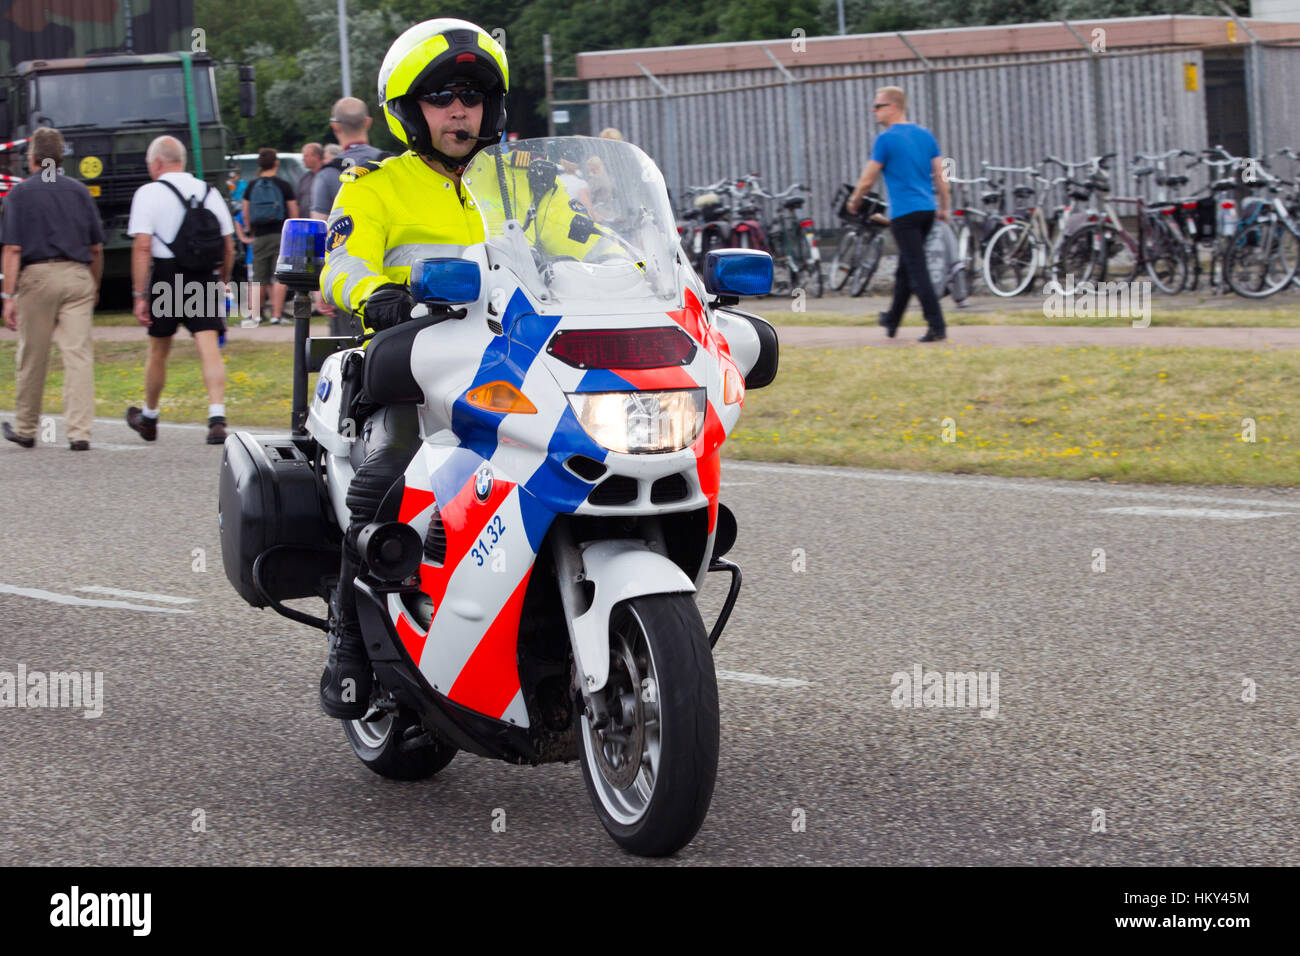 Den Helder The Netherlands July 7 Dutch Police Motorbike Stock Photo Alamy